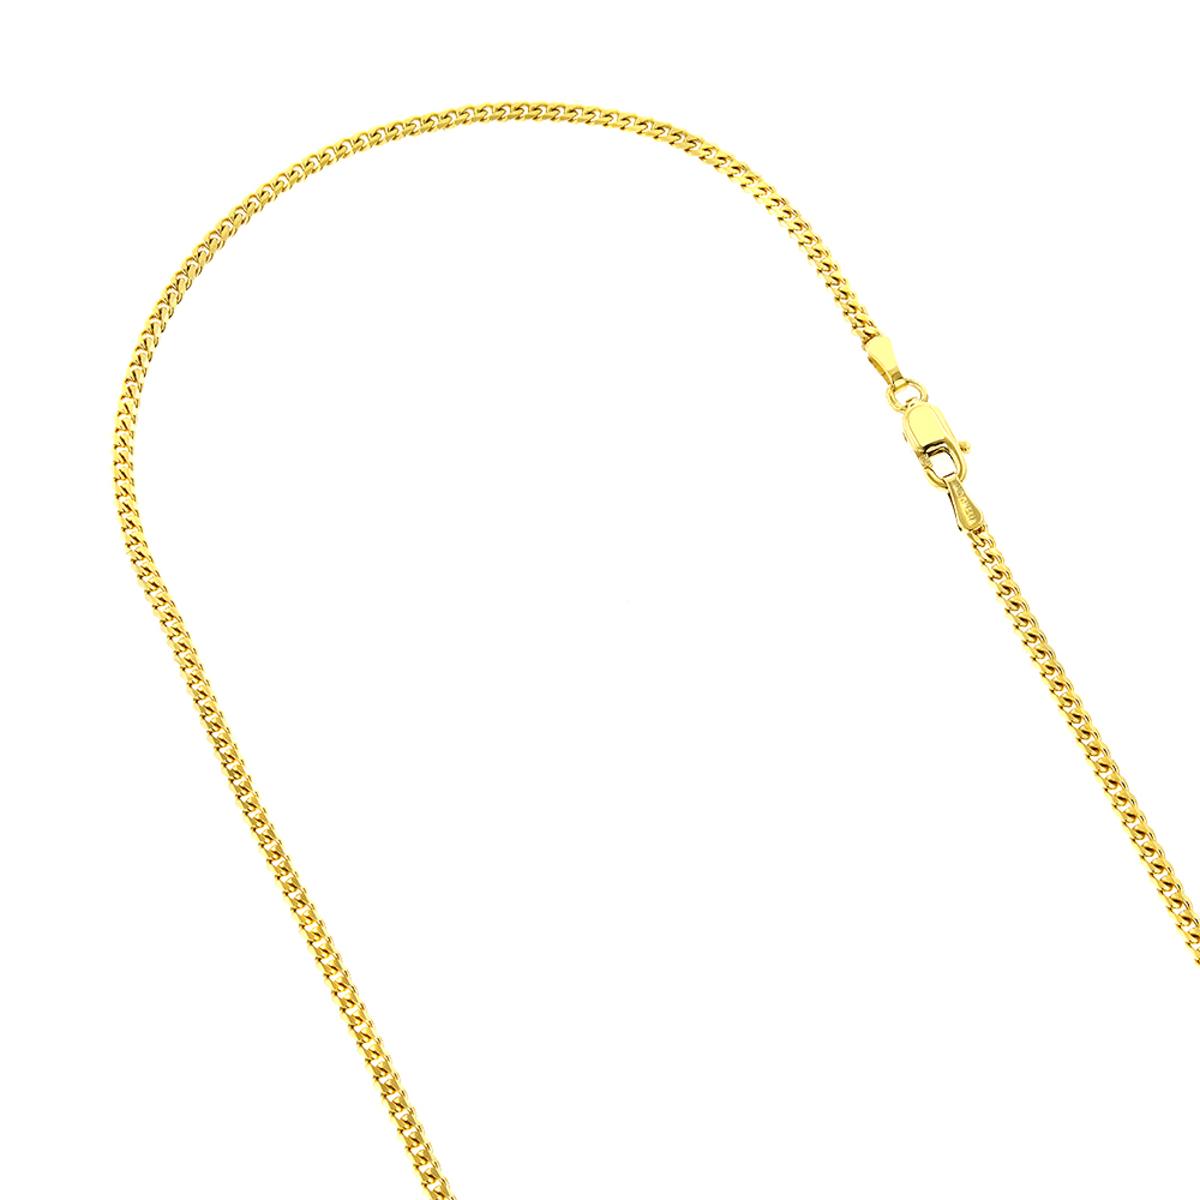 LUXURMAN Solid 14k Gold Curb Chain For Men & Women Gourmette 3mm Wide